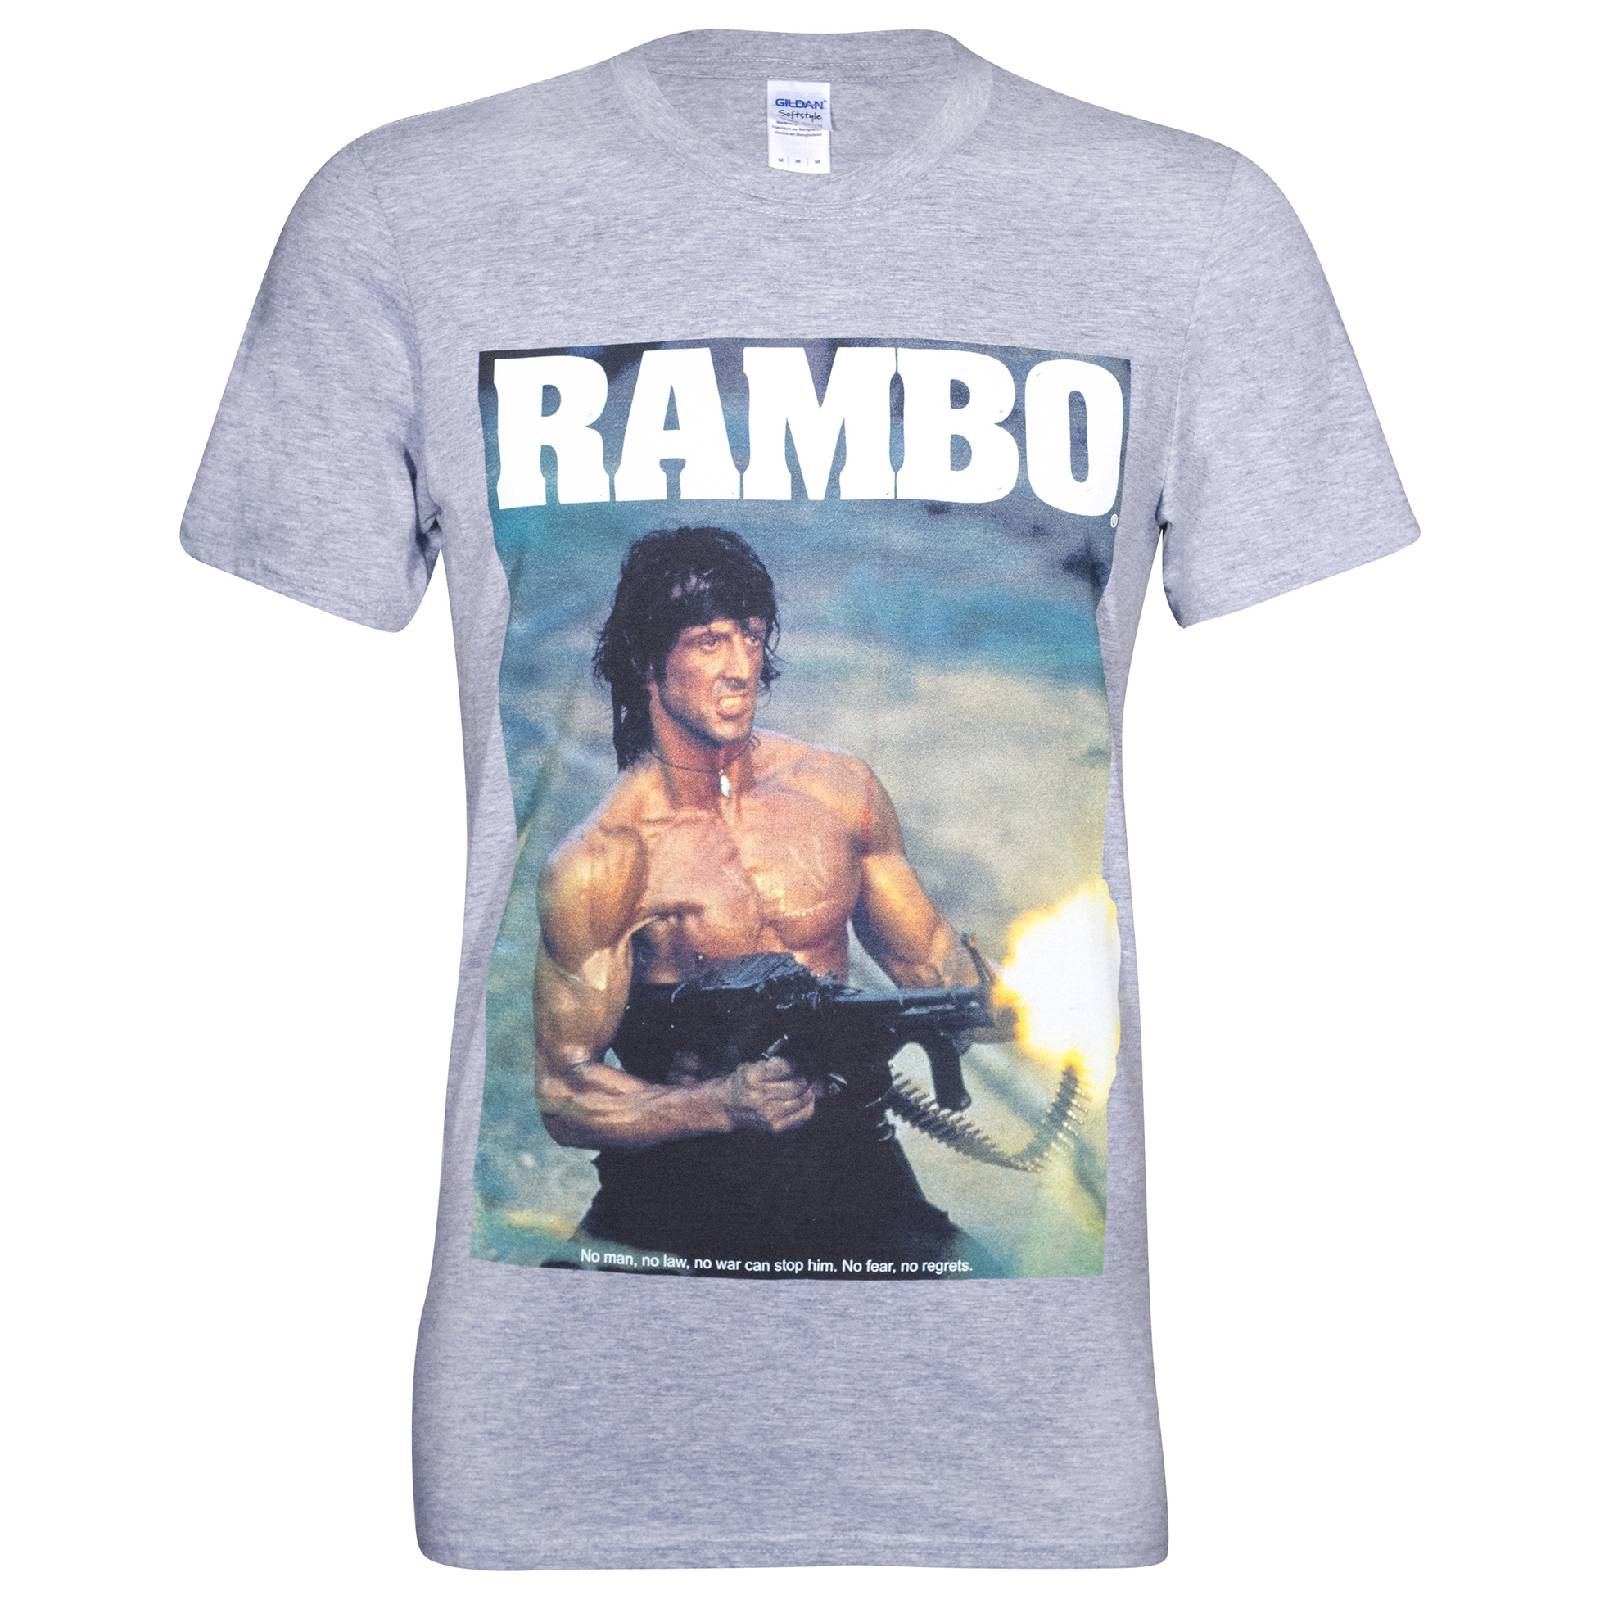 Geek Clothing Rambo Men's Gun T-Shirt - Grey - M - Grey